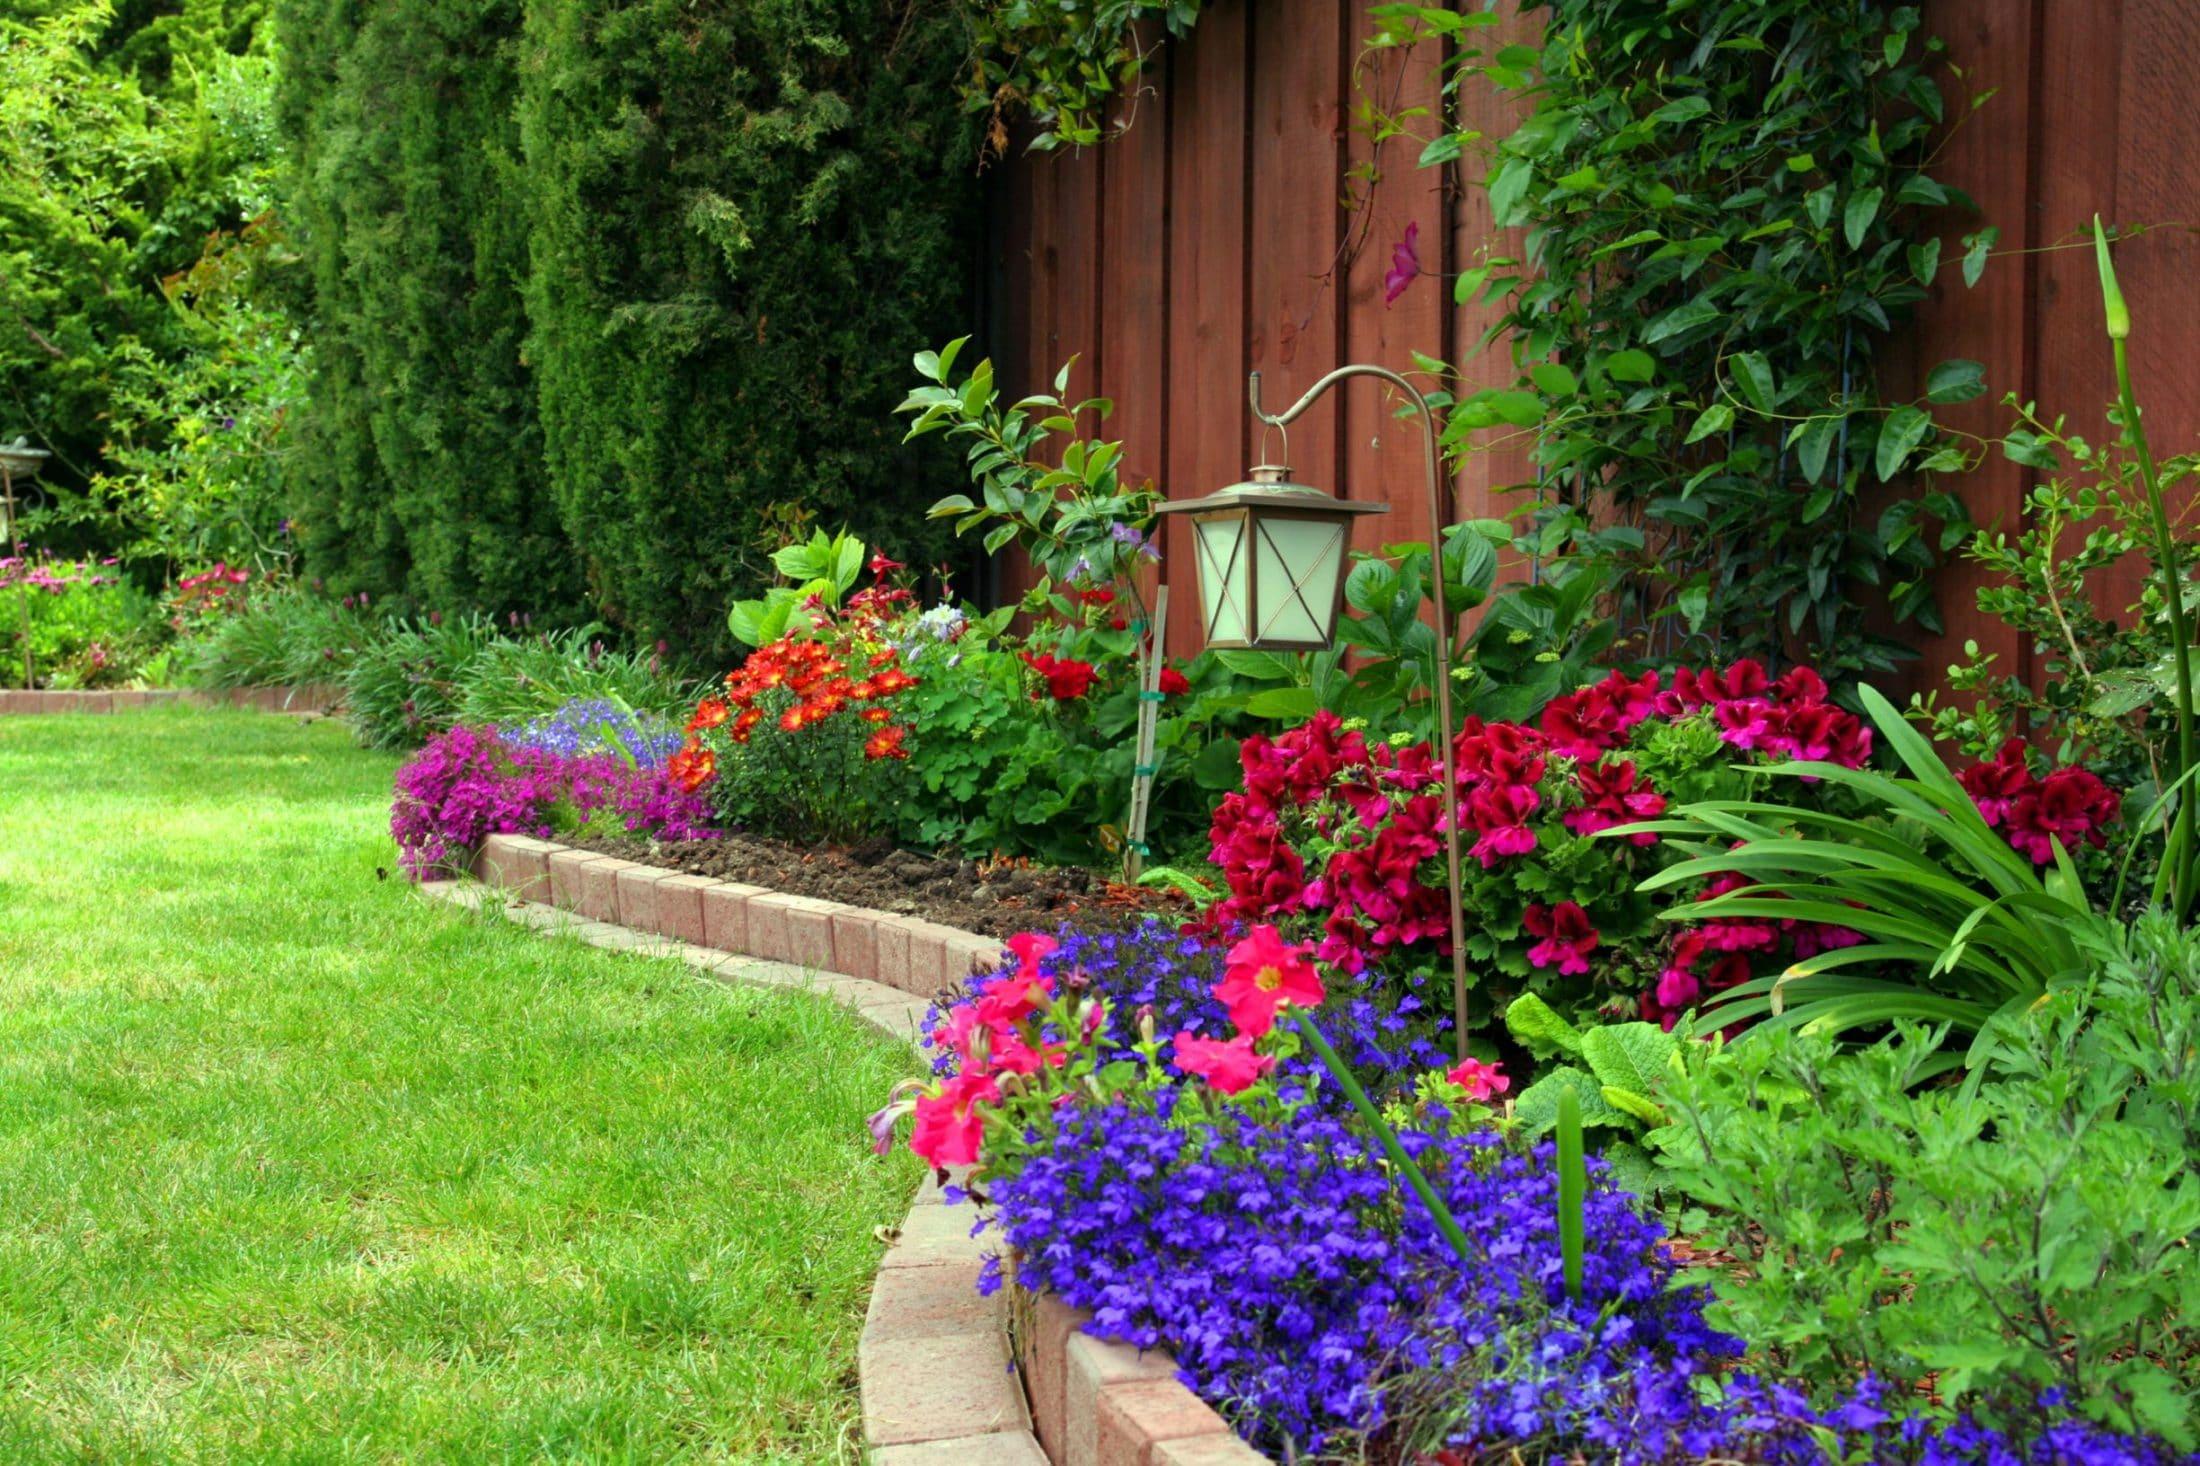 5 Advantages of Using Garden Edging